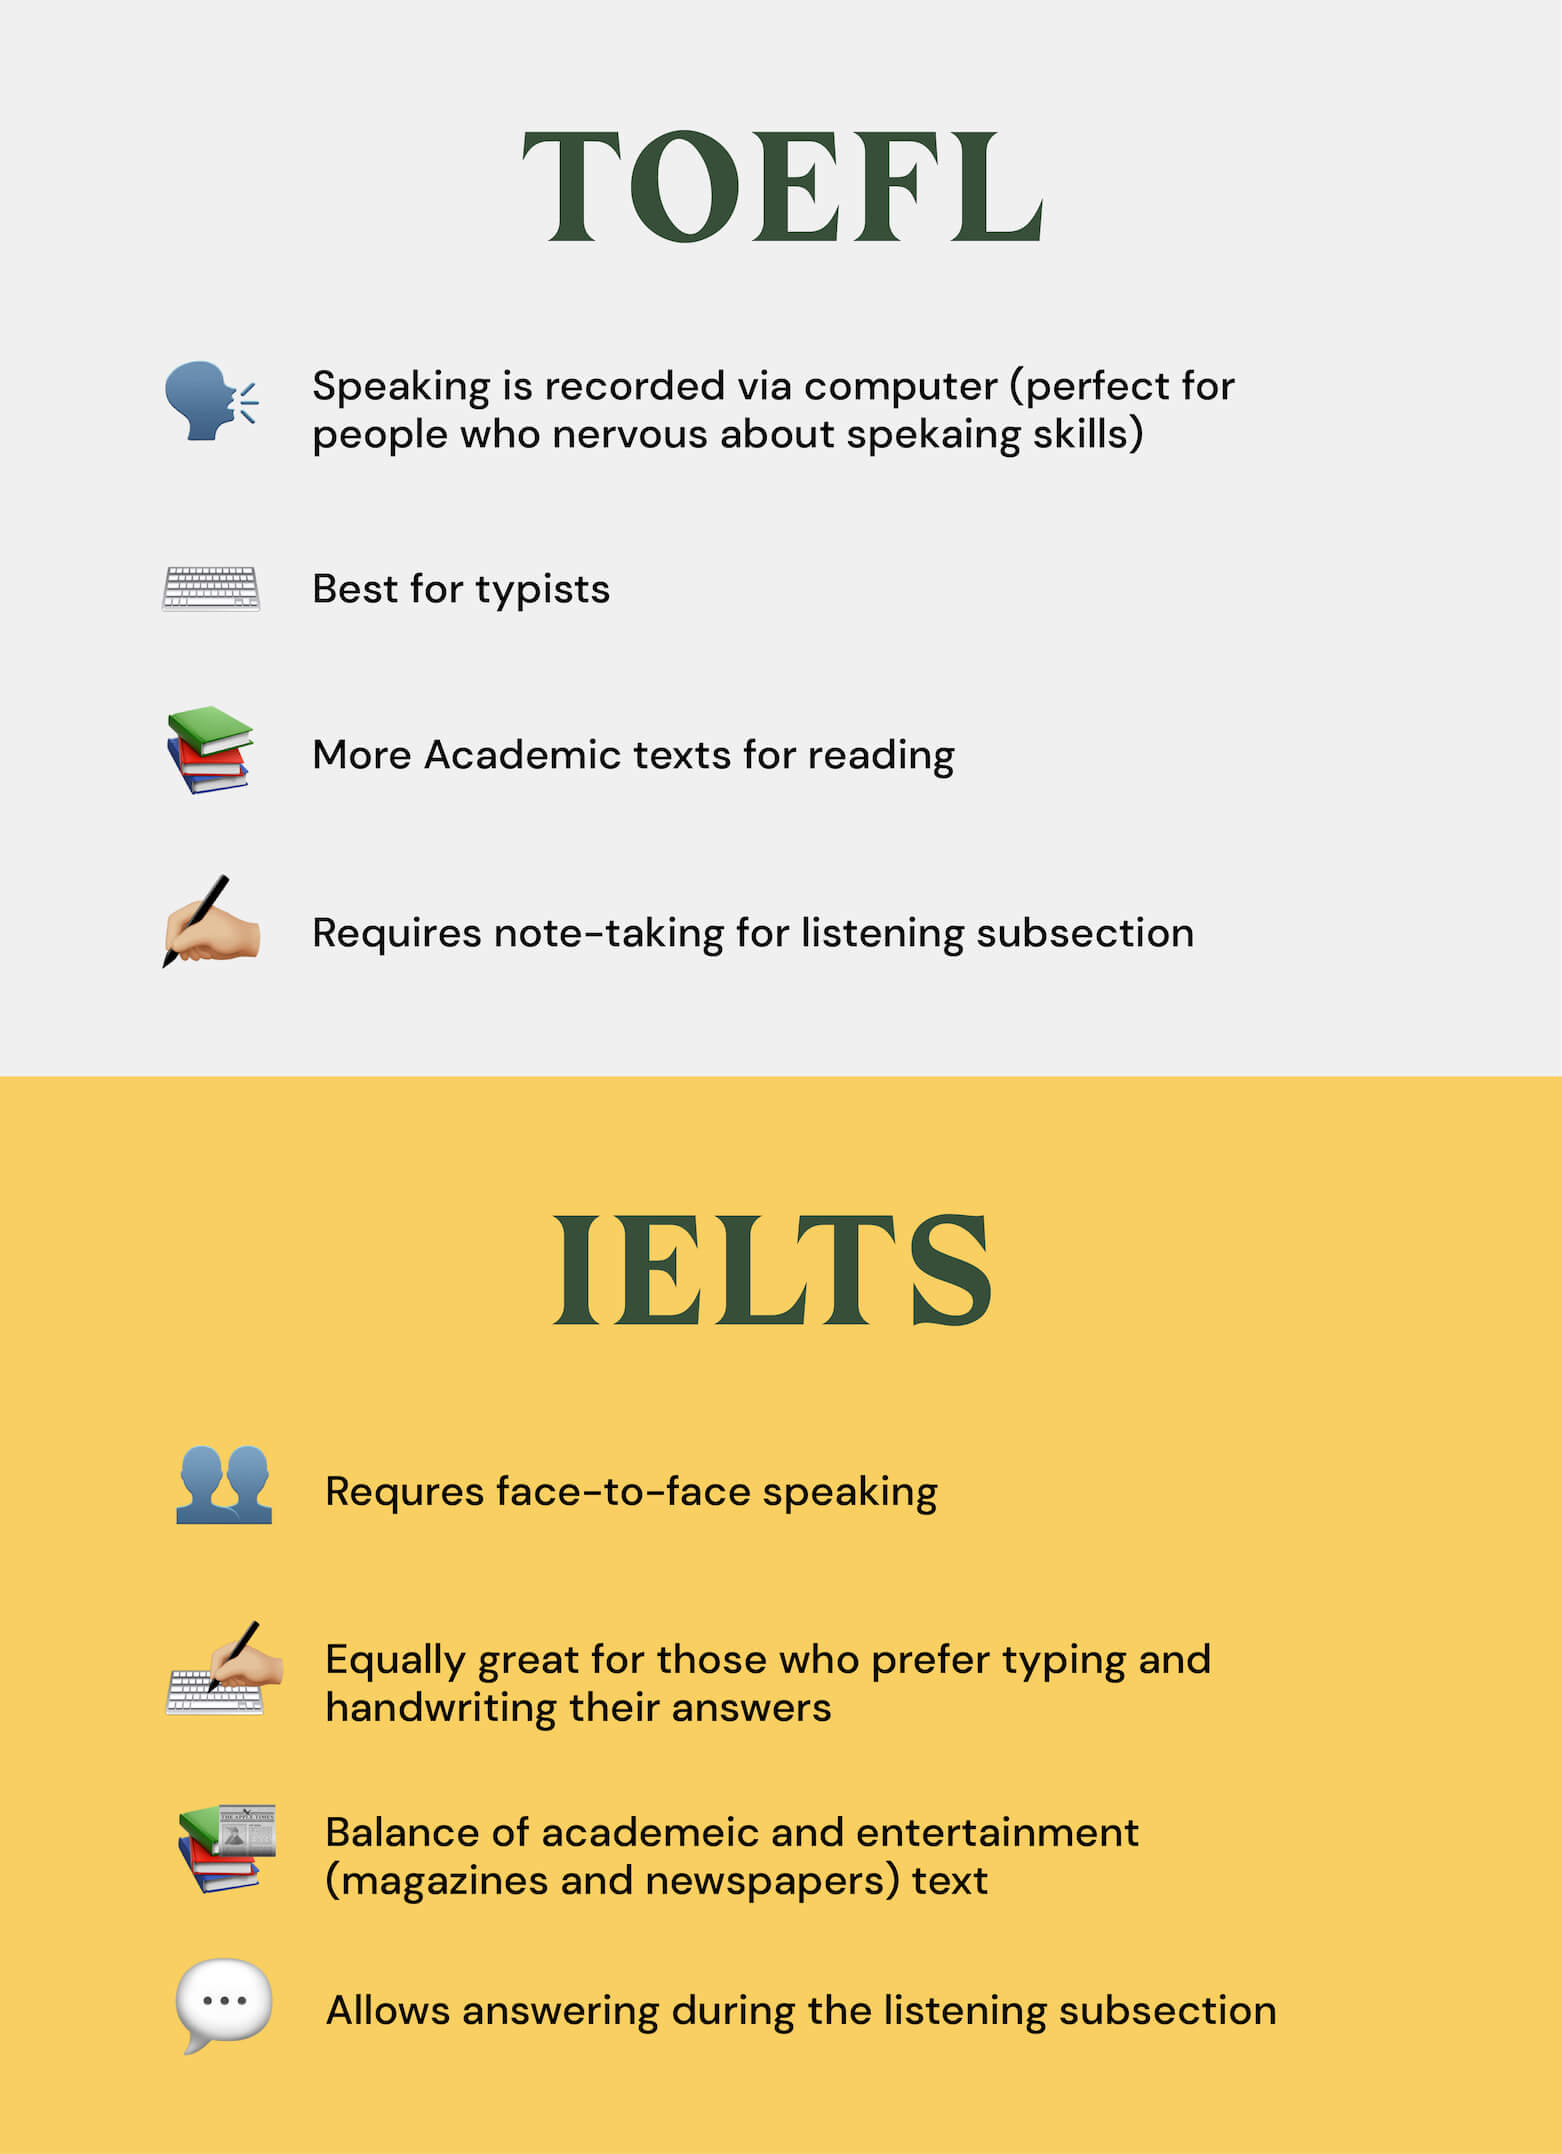 TOEFL vs IELTS - difference